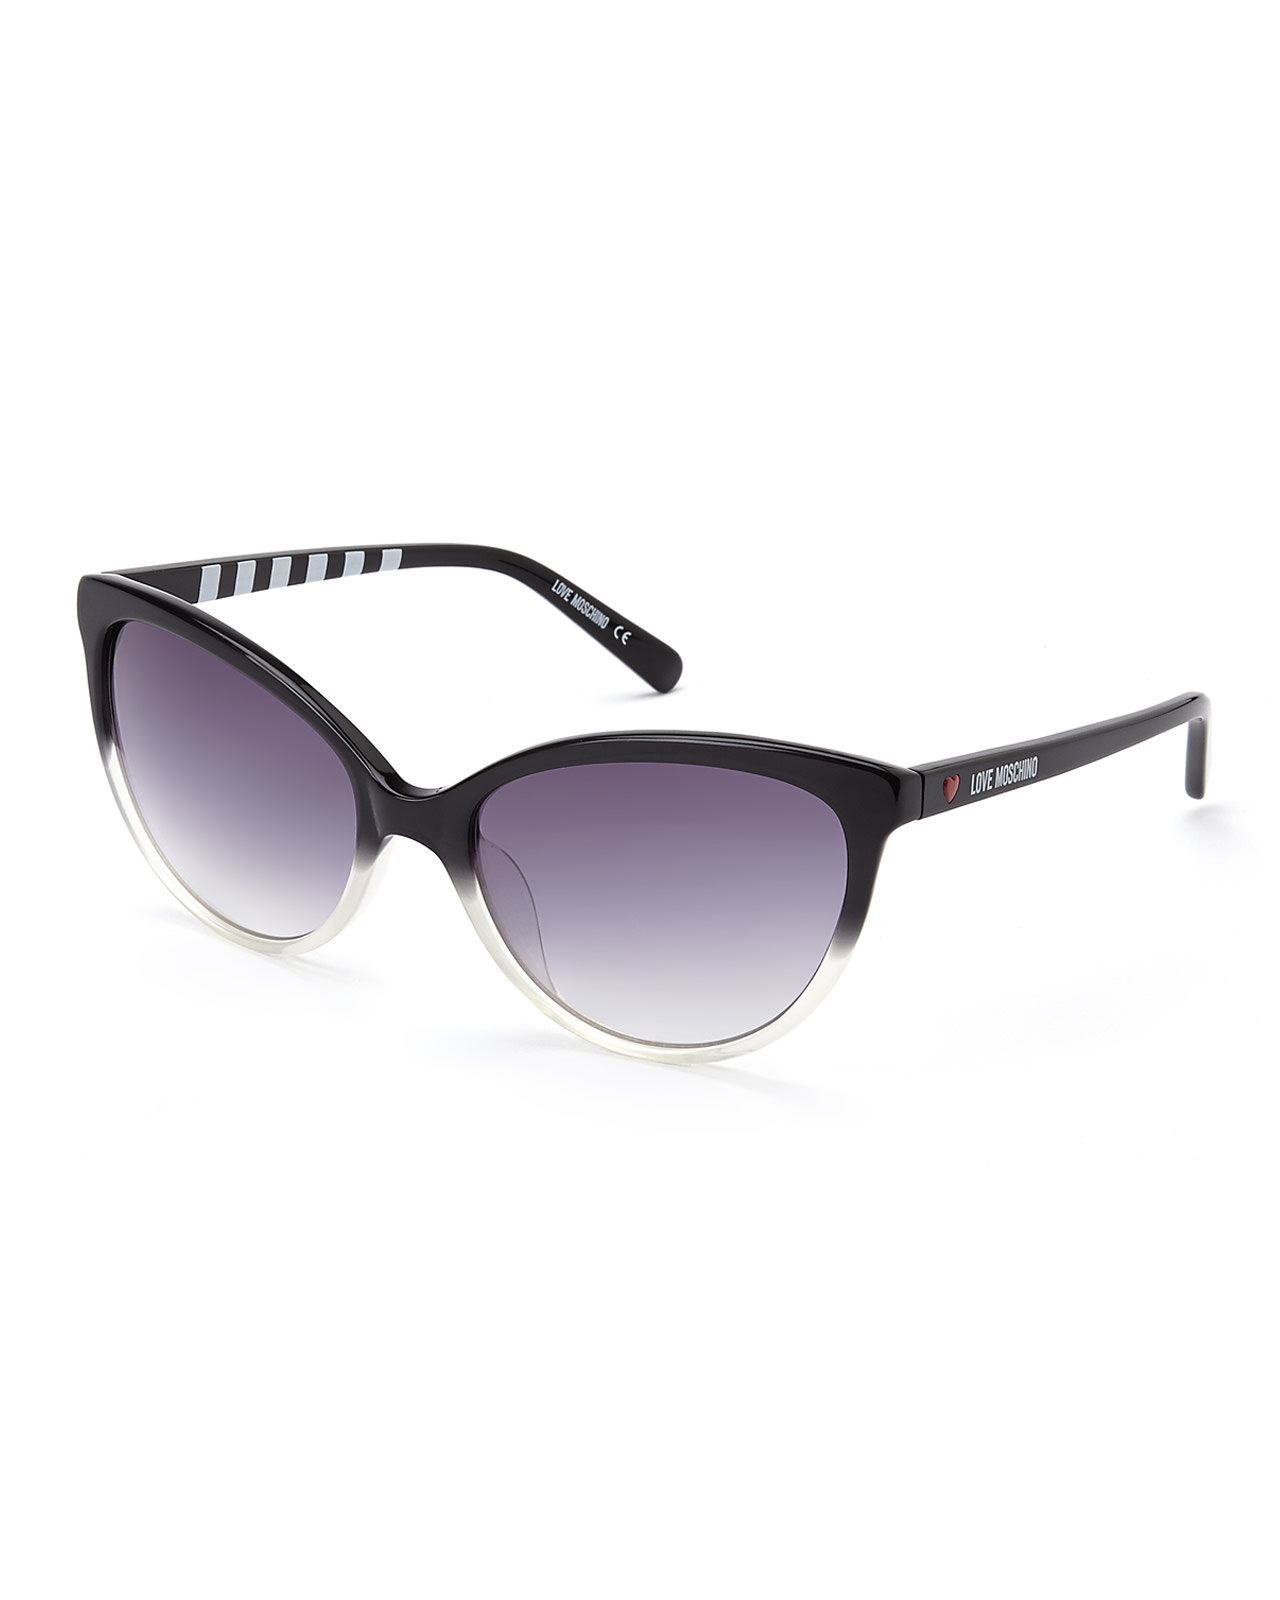 35c8a466d8f Lyst - Love Moschino Ml50601 Two-Tone Cat Eye Sunglasses in Black